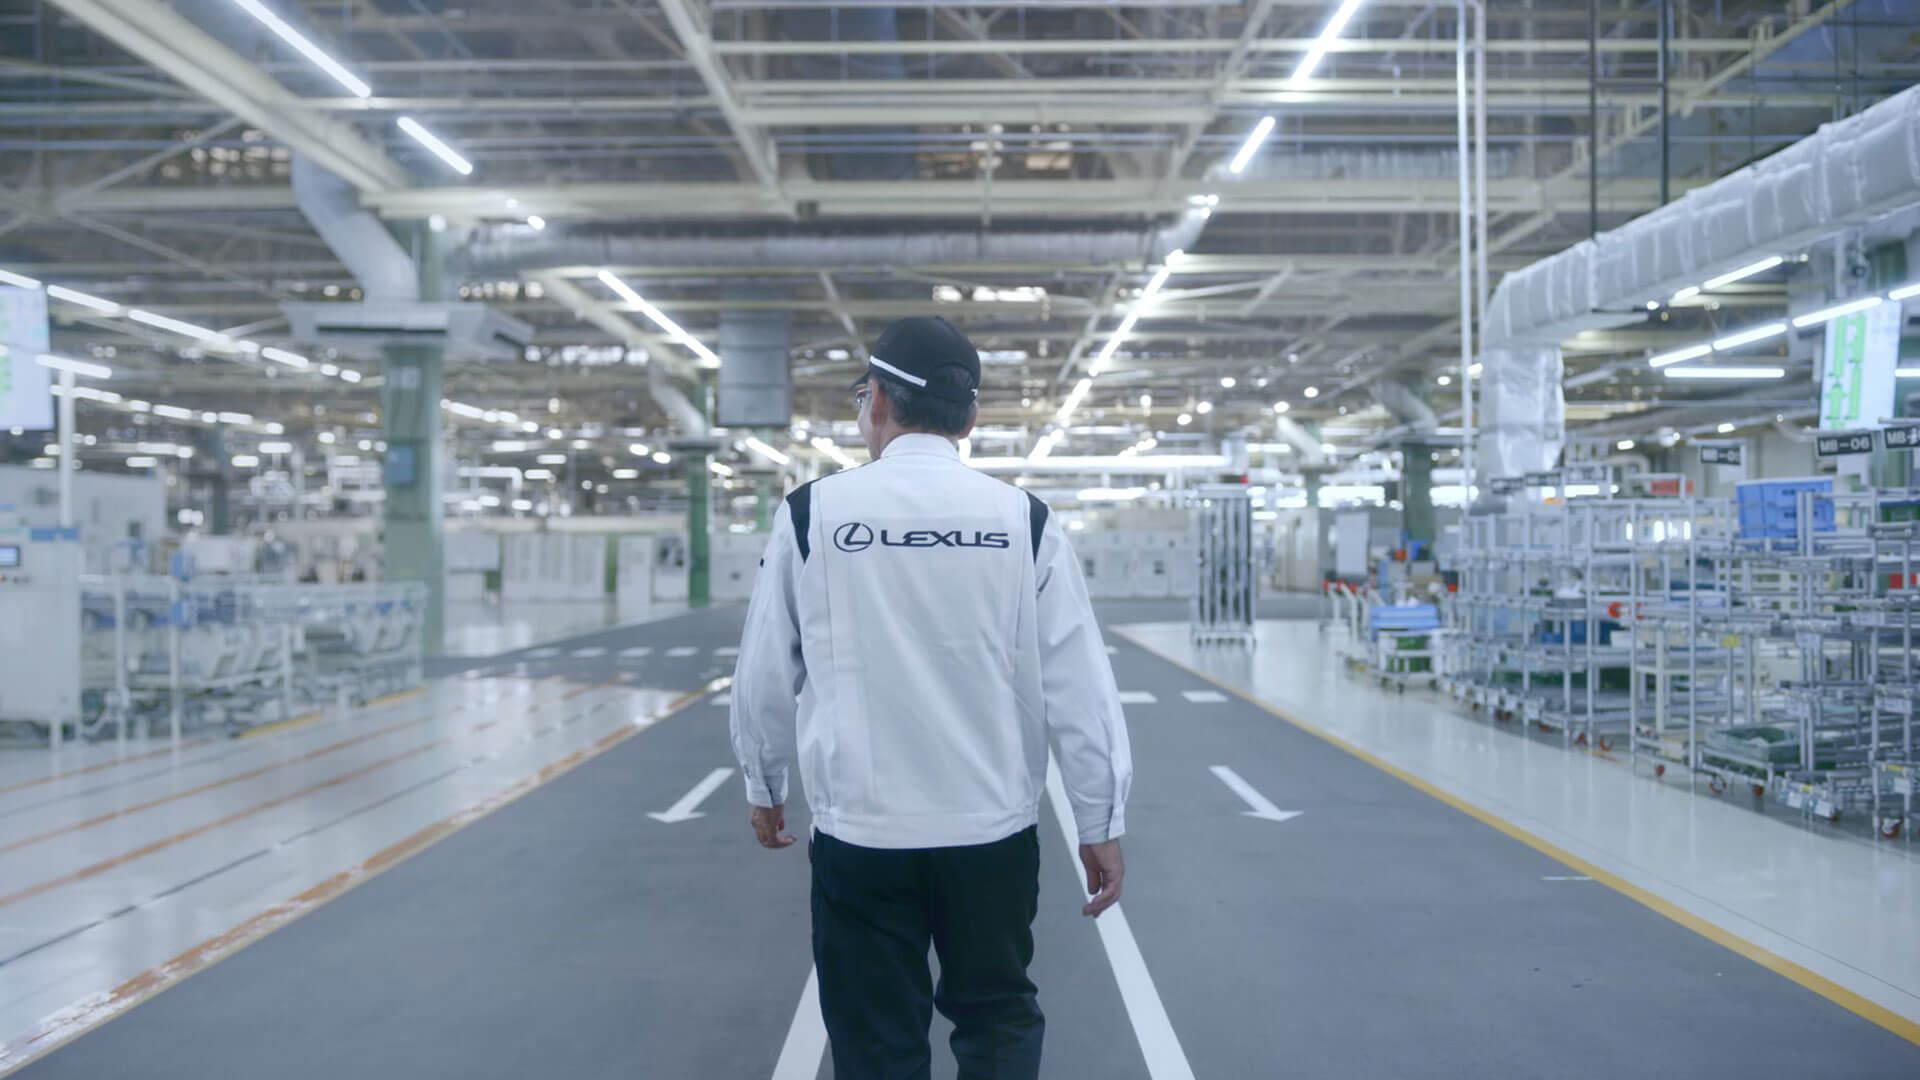 2019 lexus takumi living video superhuman hearing